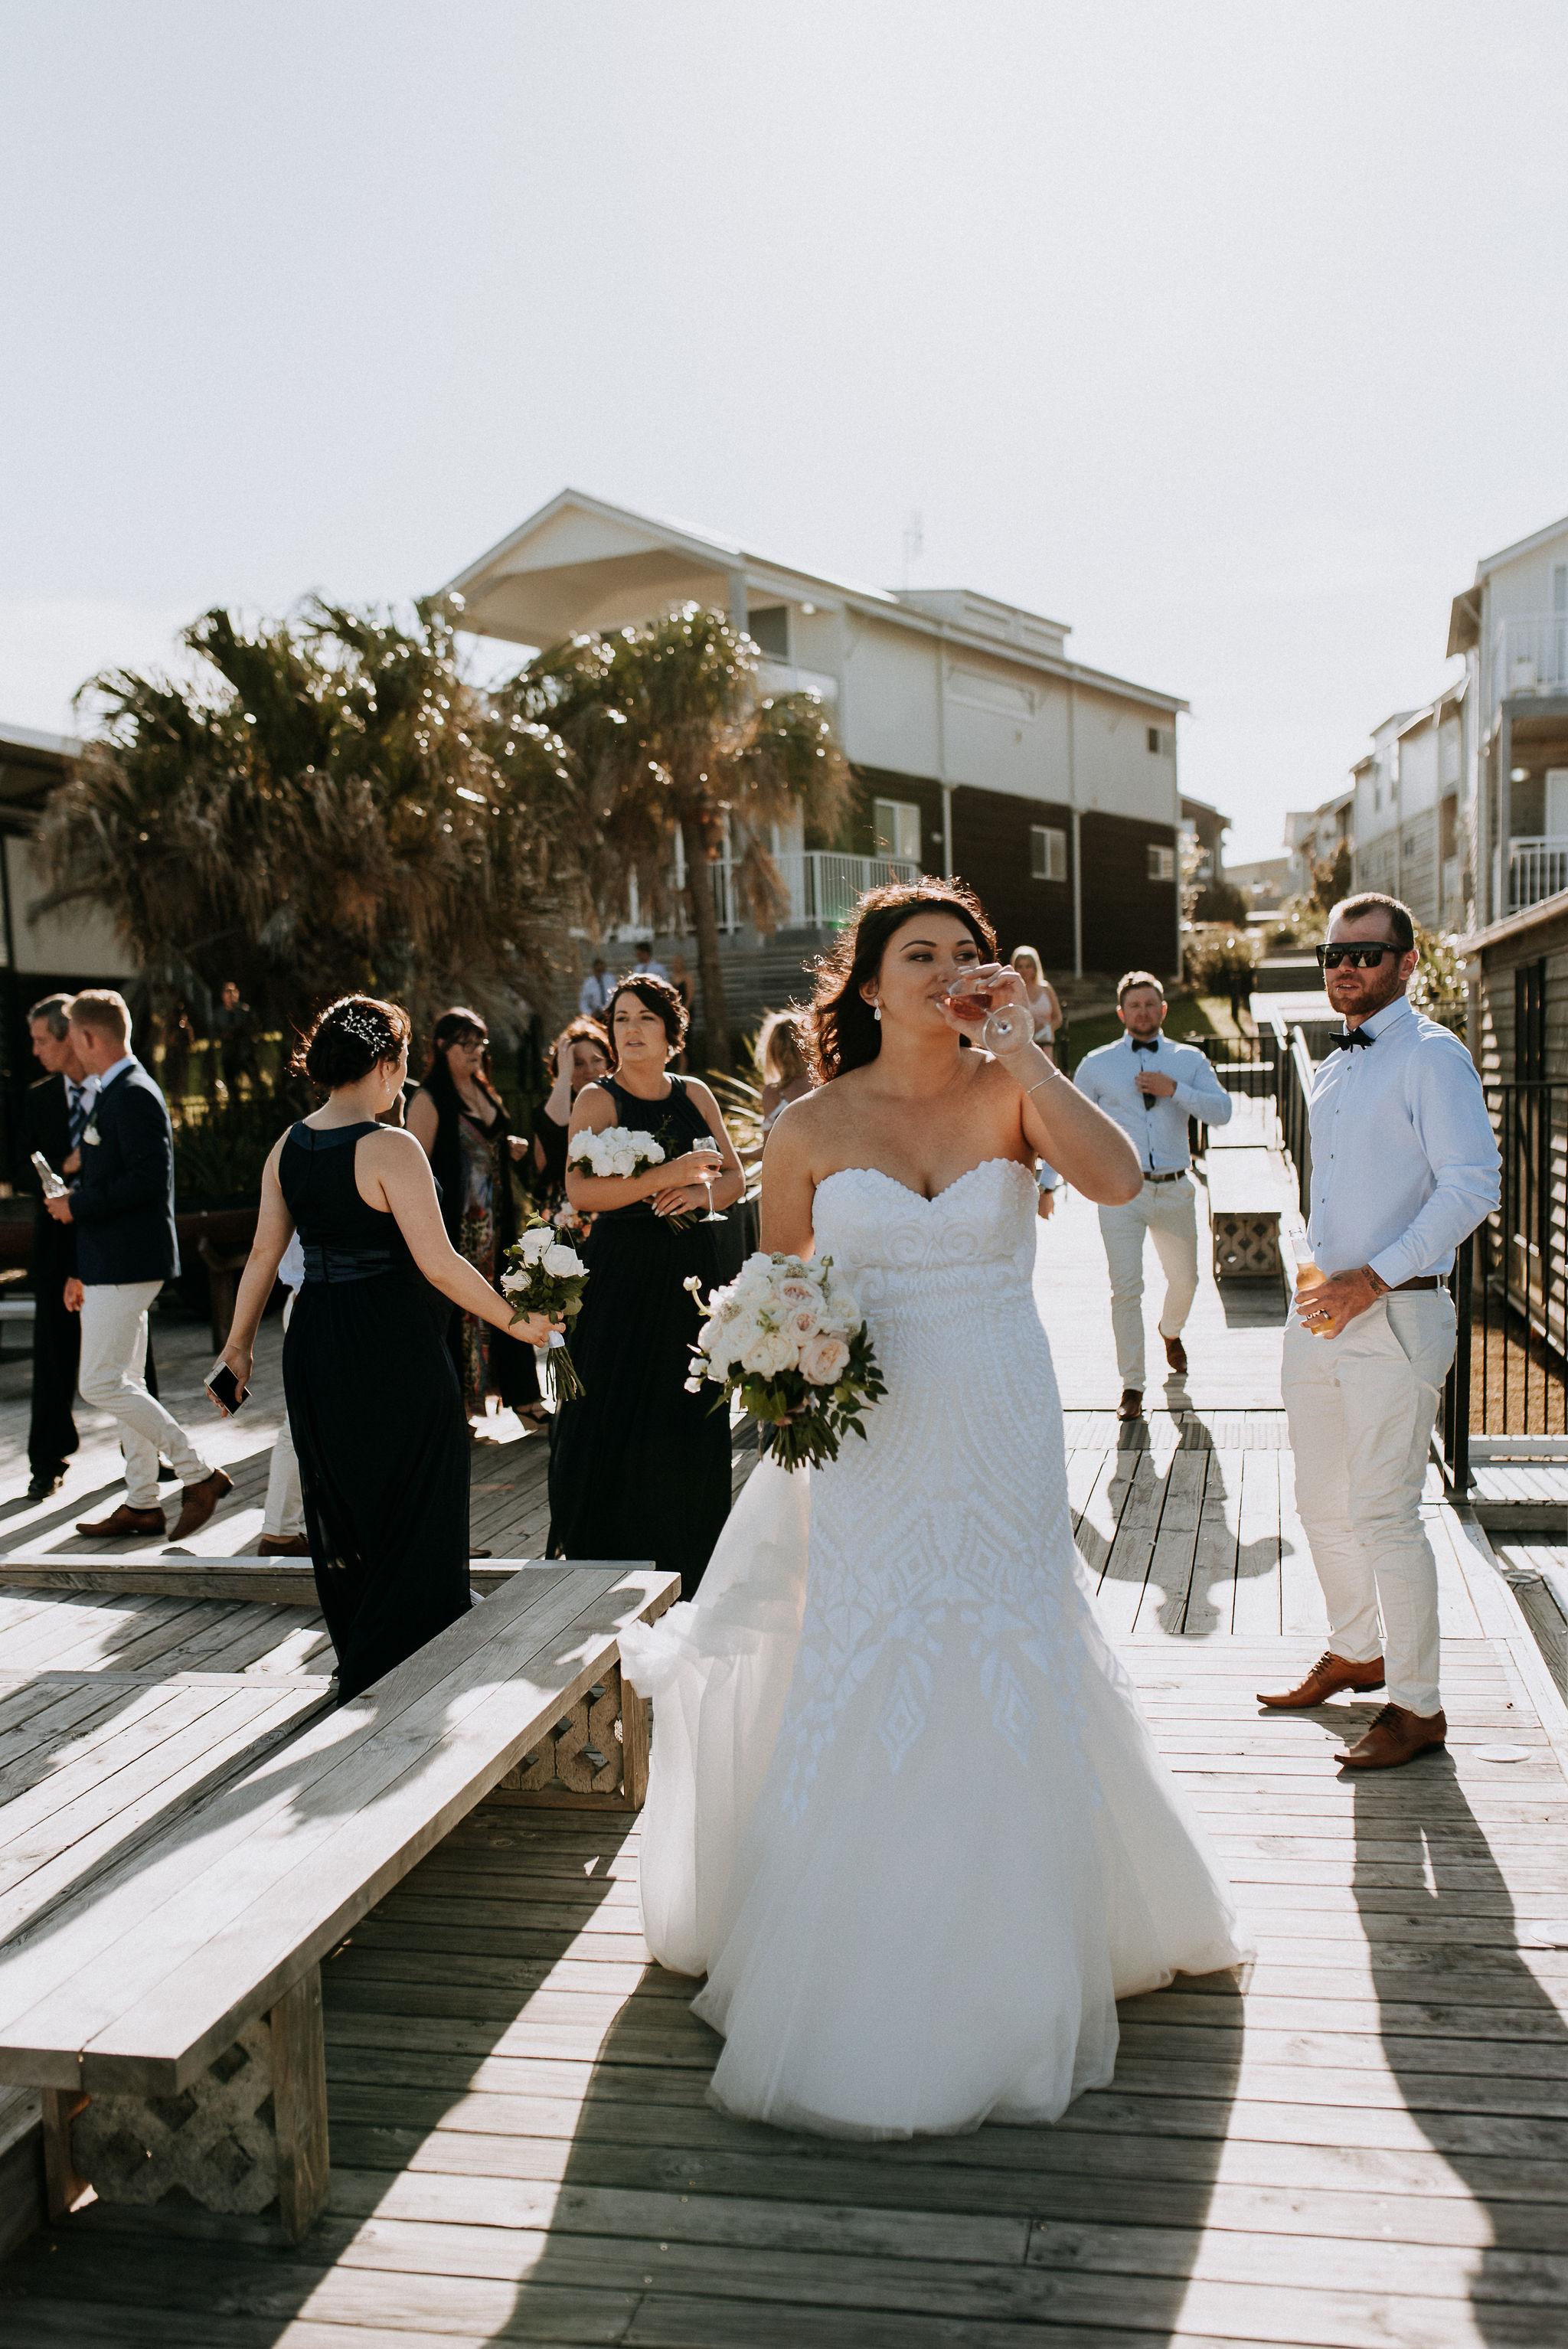 CAVES-BEACH-HOTEL-WEDDING-PATTEN-608.jpg